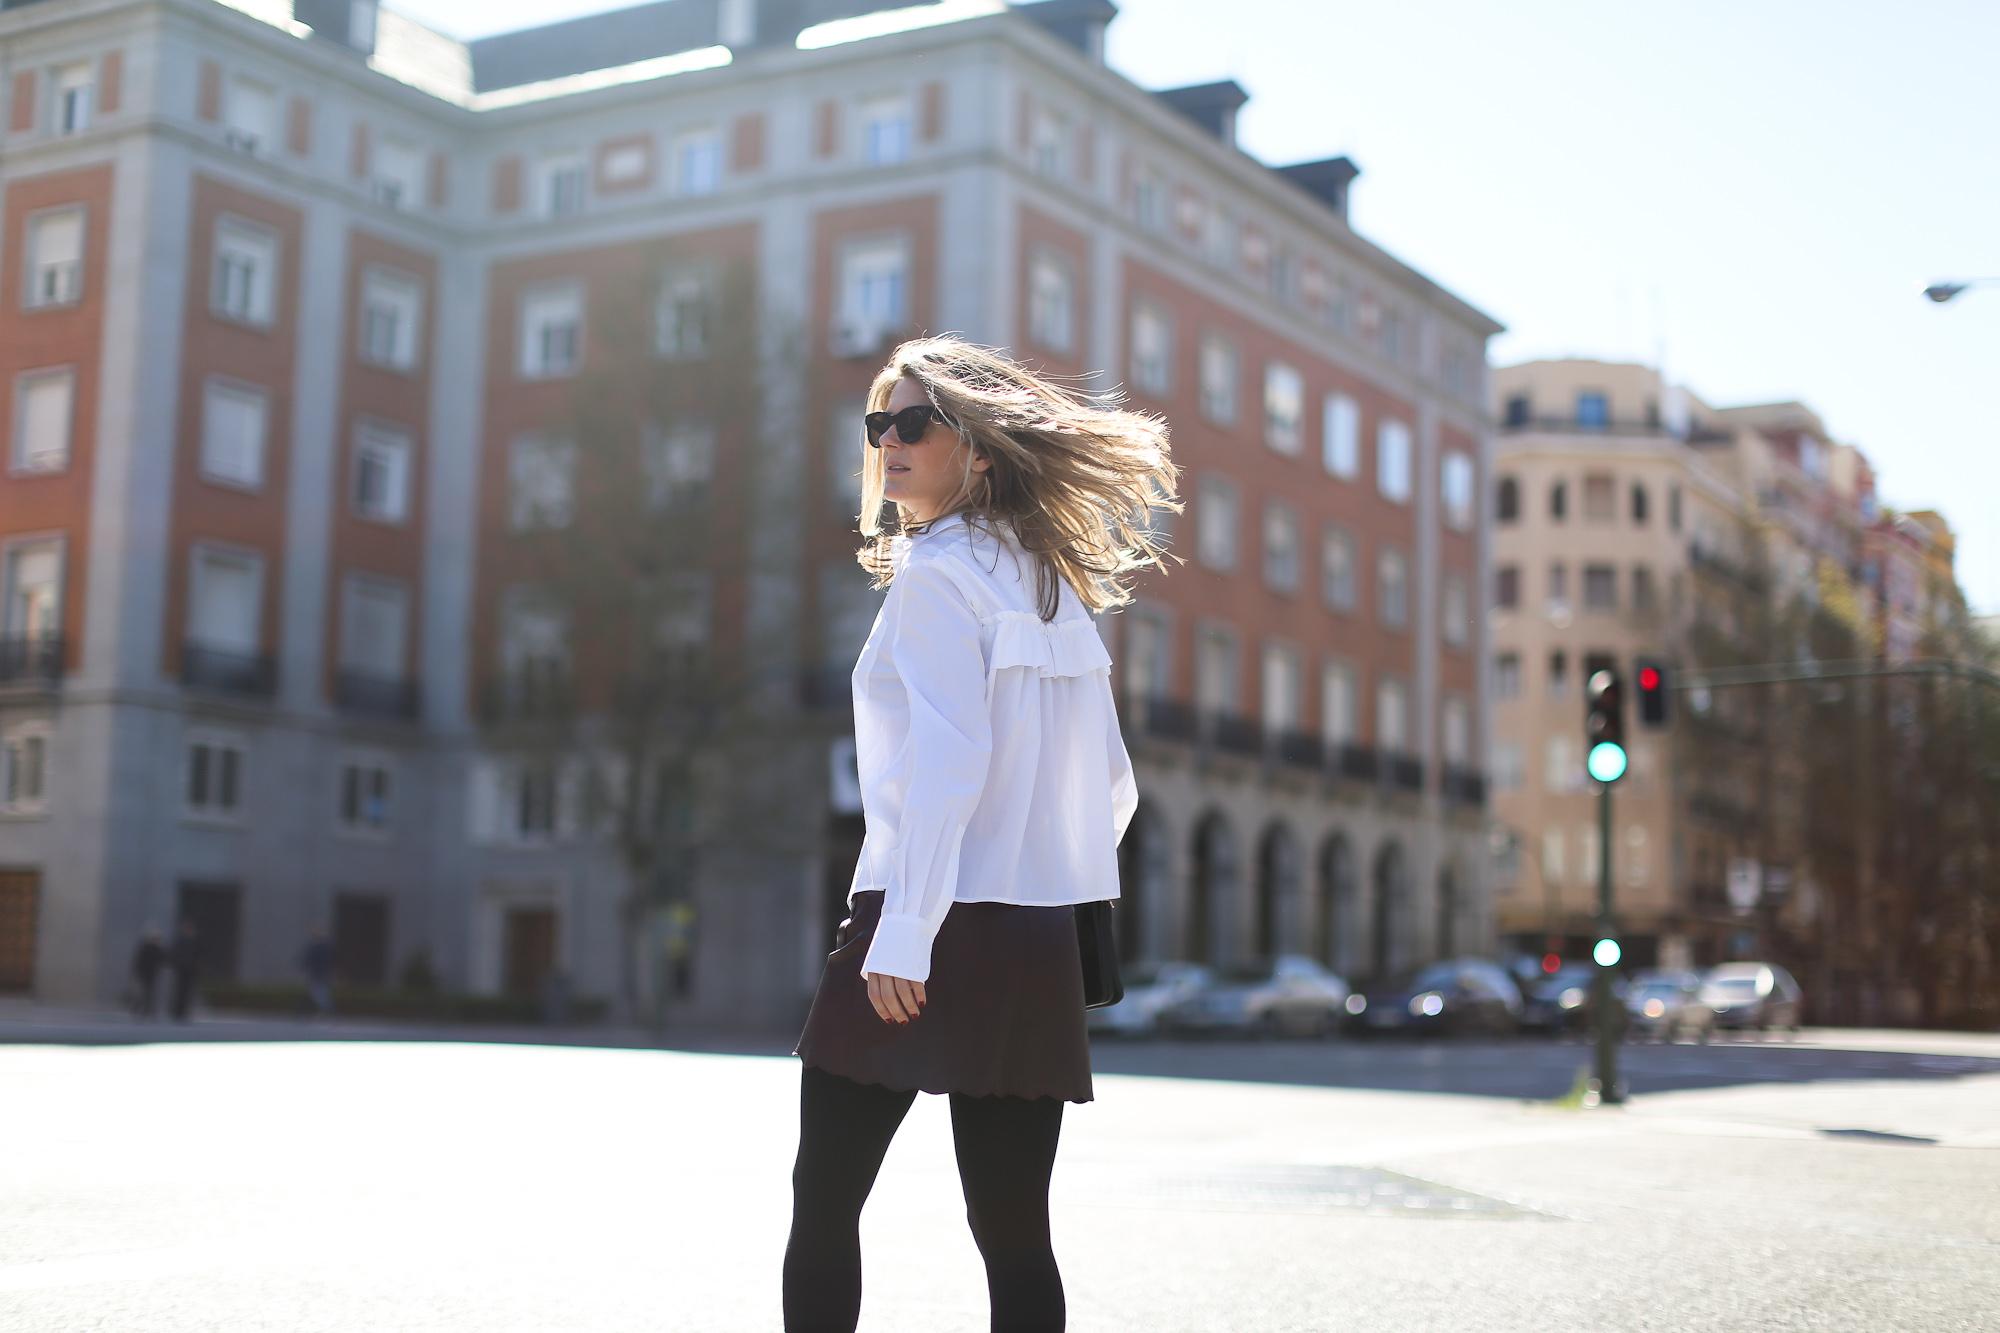 Clochet_streetstyle_maxandCo_leatherminiskirt_h&mtrend_blouse_sandroparis-brogues-4